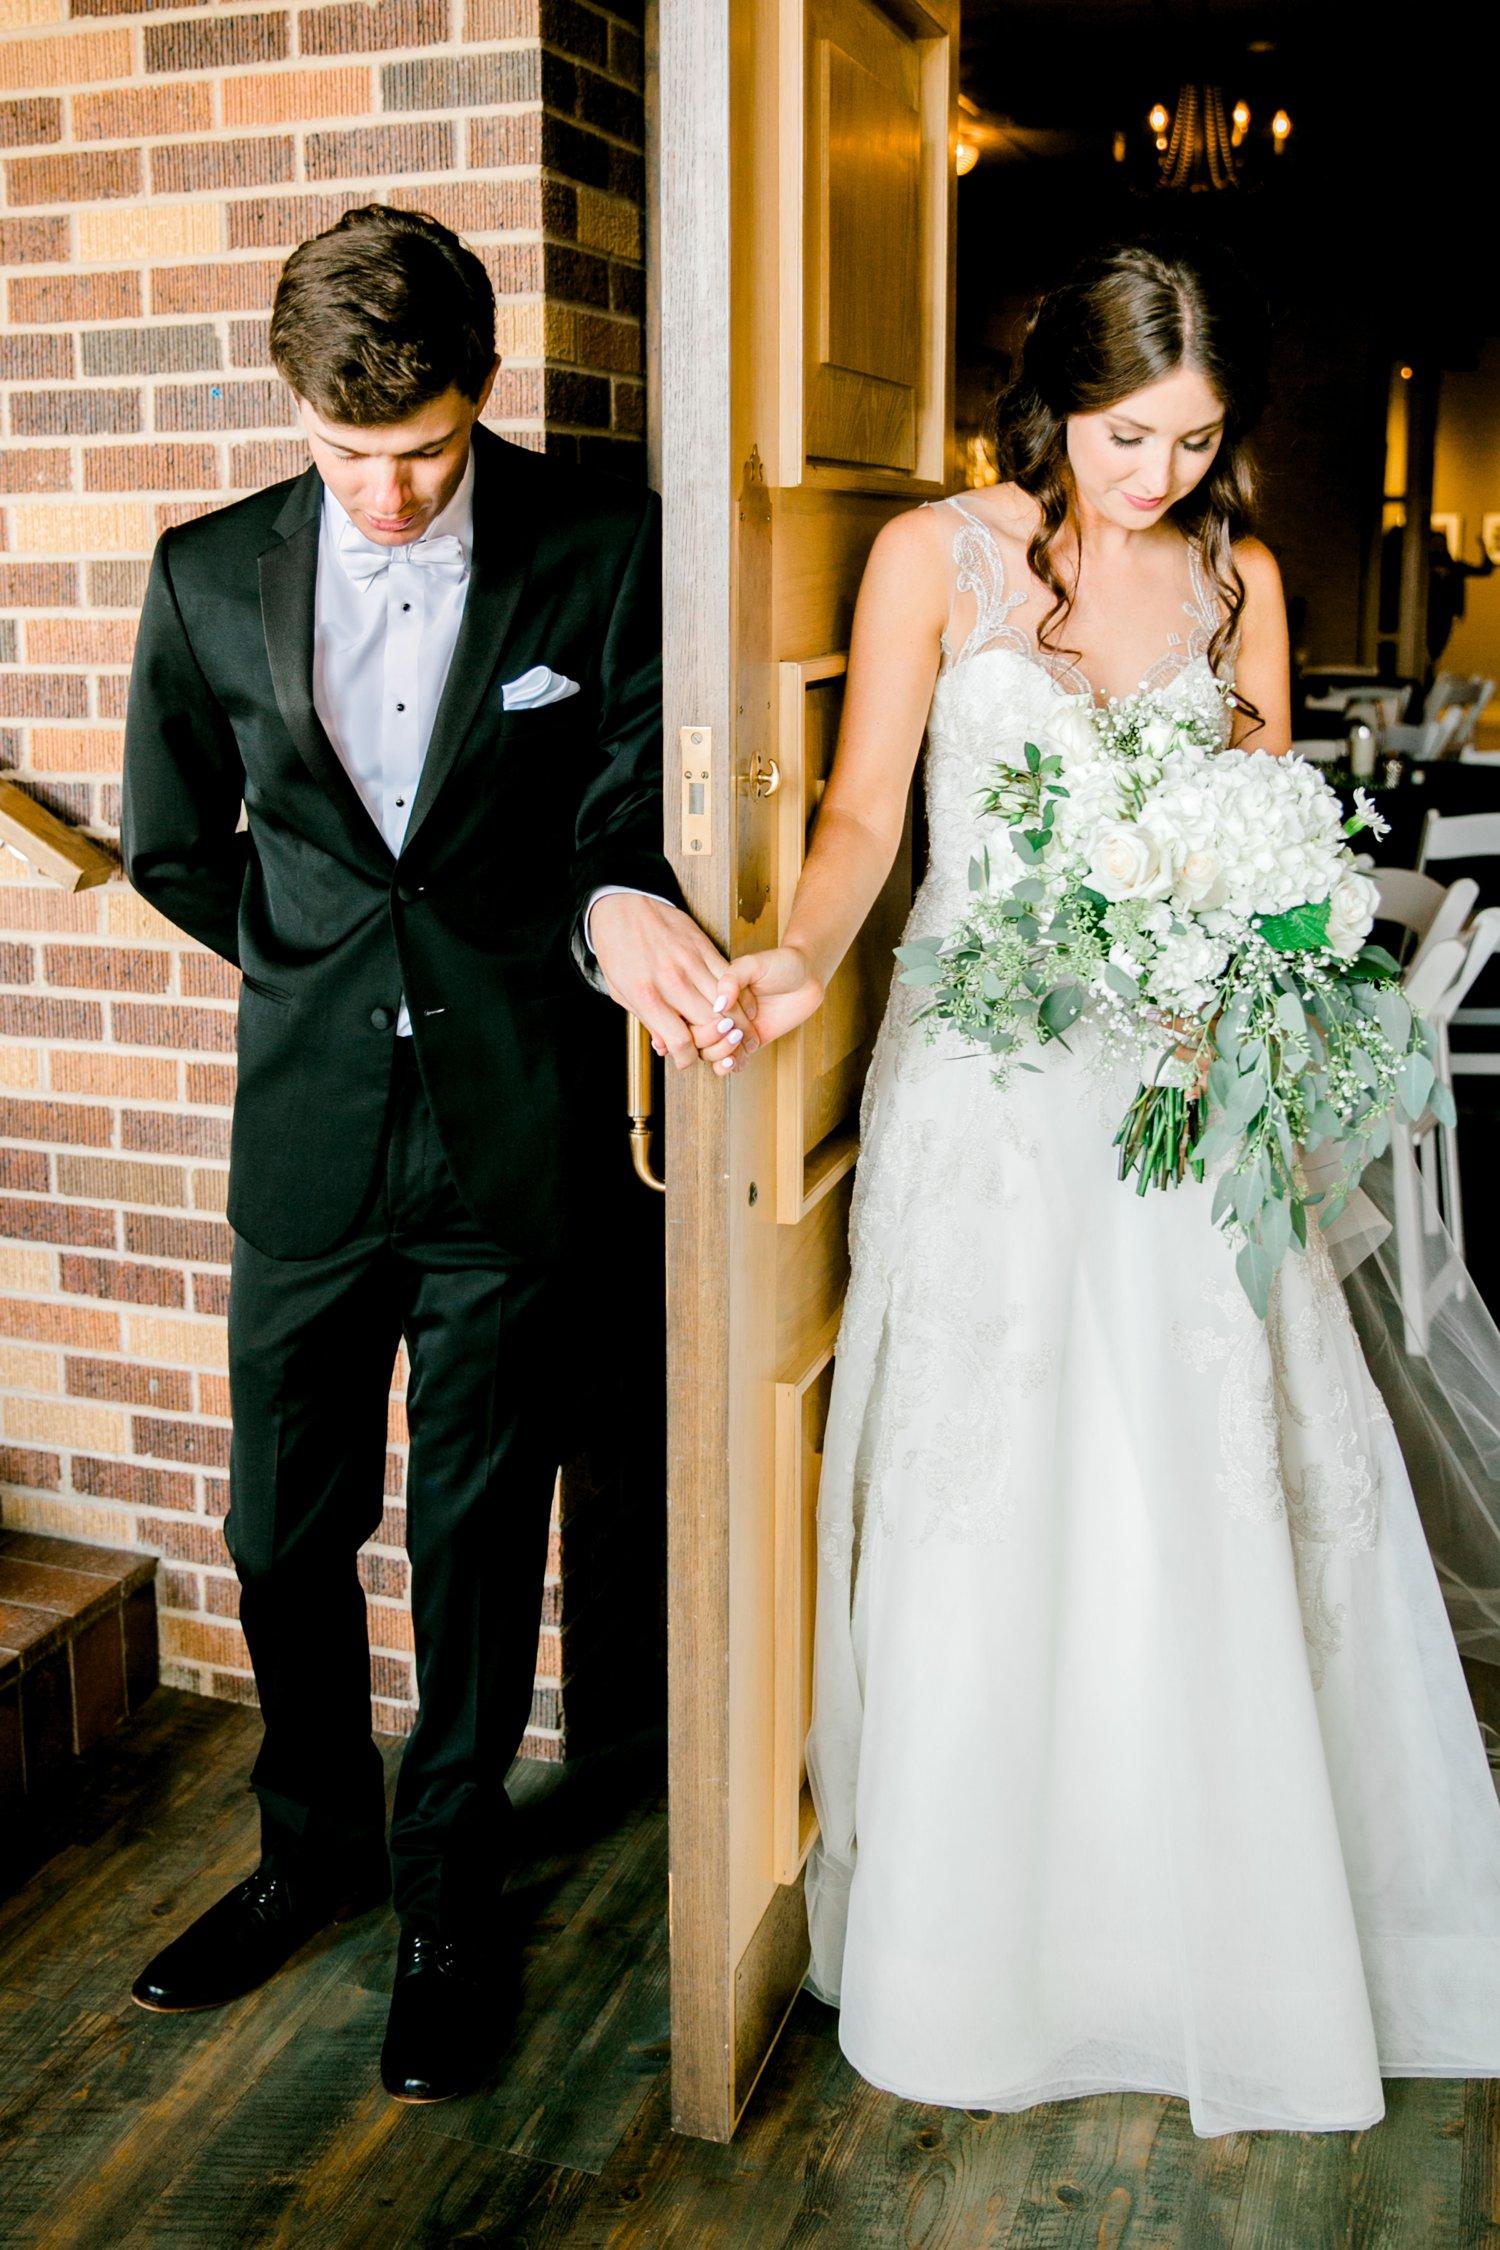 Hunter_and_Molly_Rawls_ALLEEJ_Lubbock_WEDDING_Legacy_Event_Center_0056.jpg